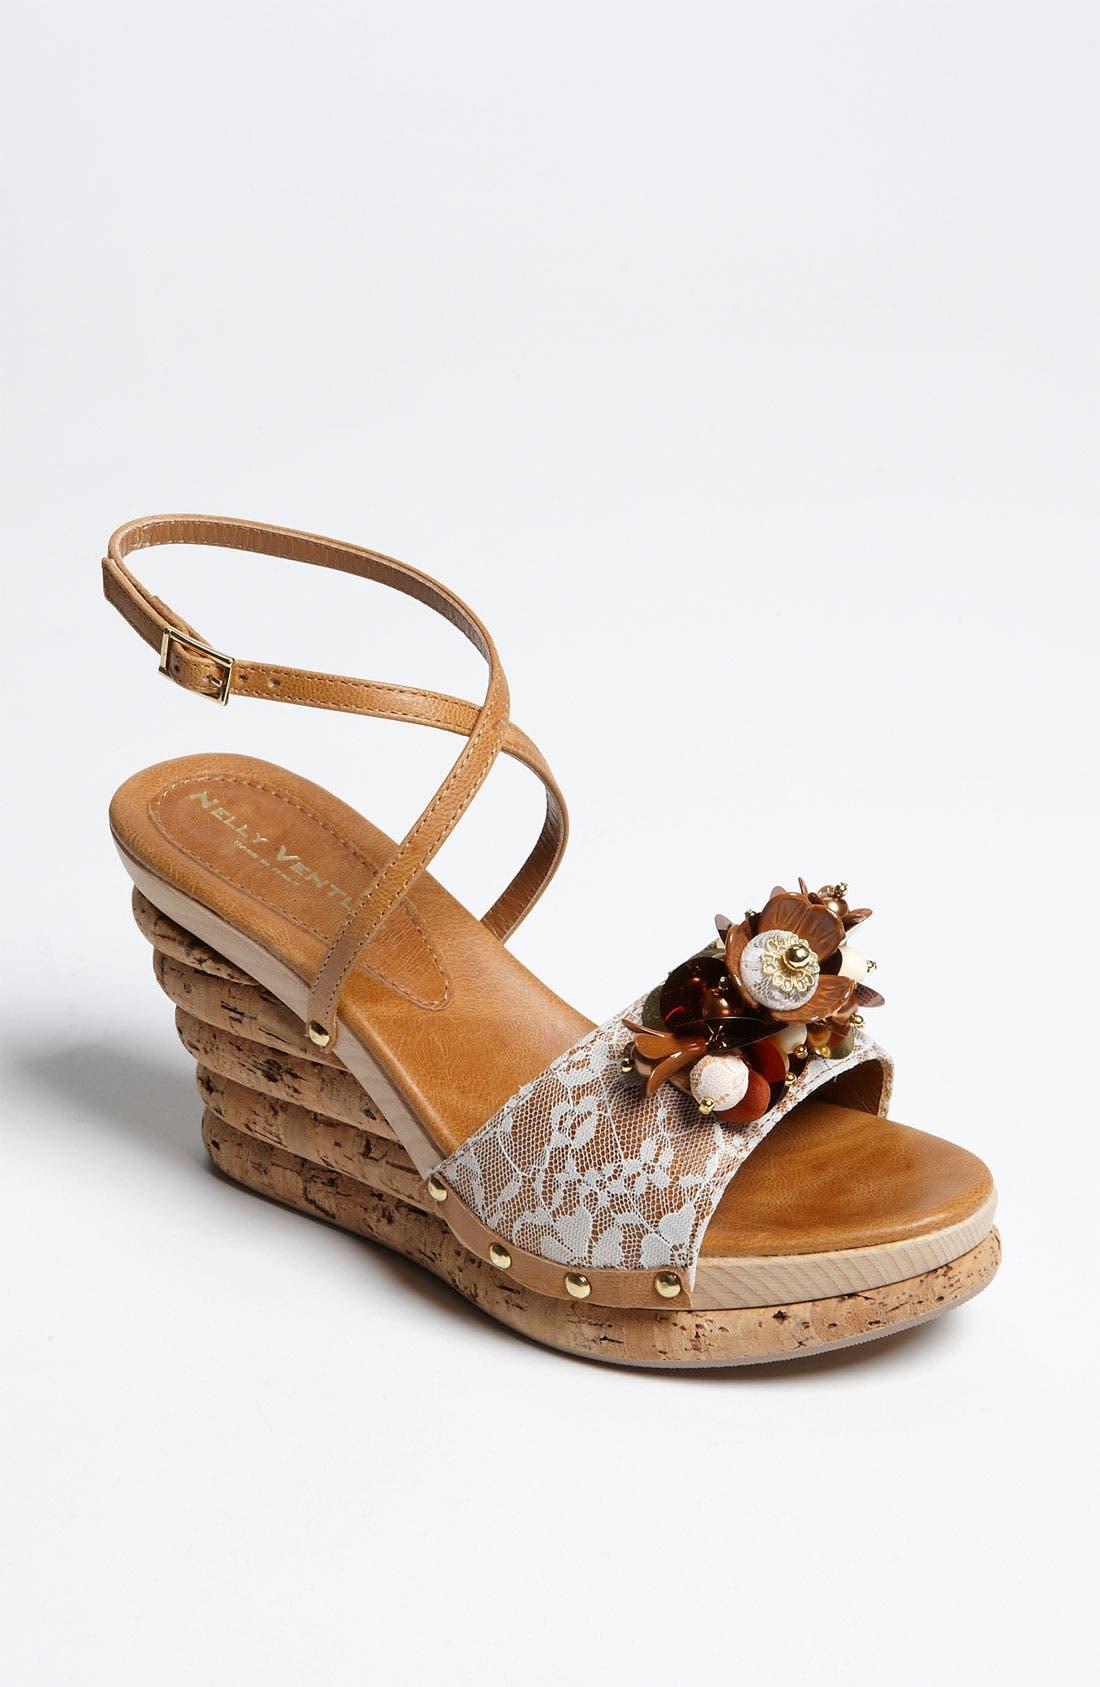 Alternate Image 1 Selected - Nelly Venturi '305 Mod' Sandal